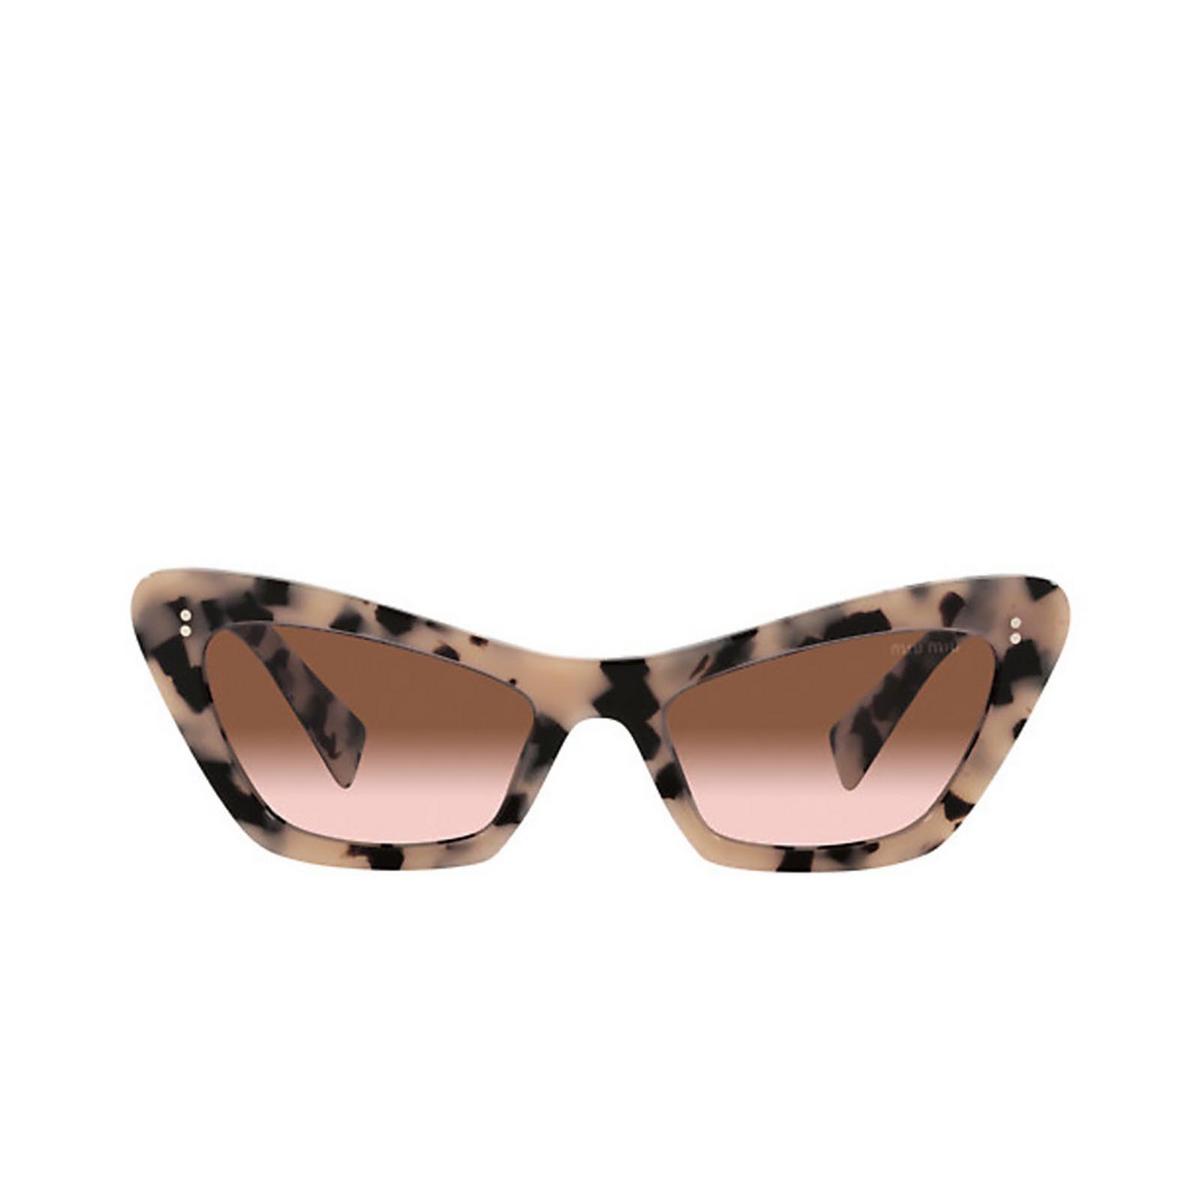 Miu Miu® Cat-eye Sunglasses: MU 03XS color Havana / Transparent Pink 07D0A6.